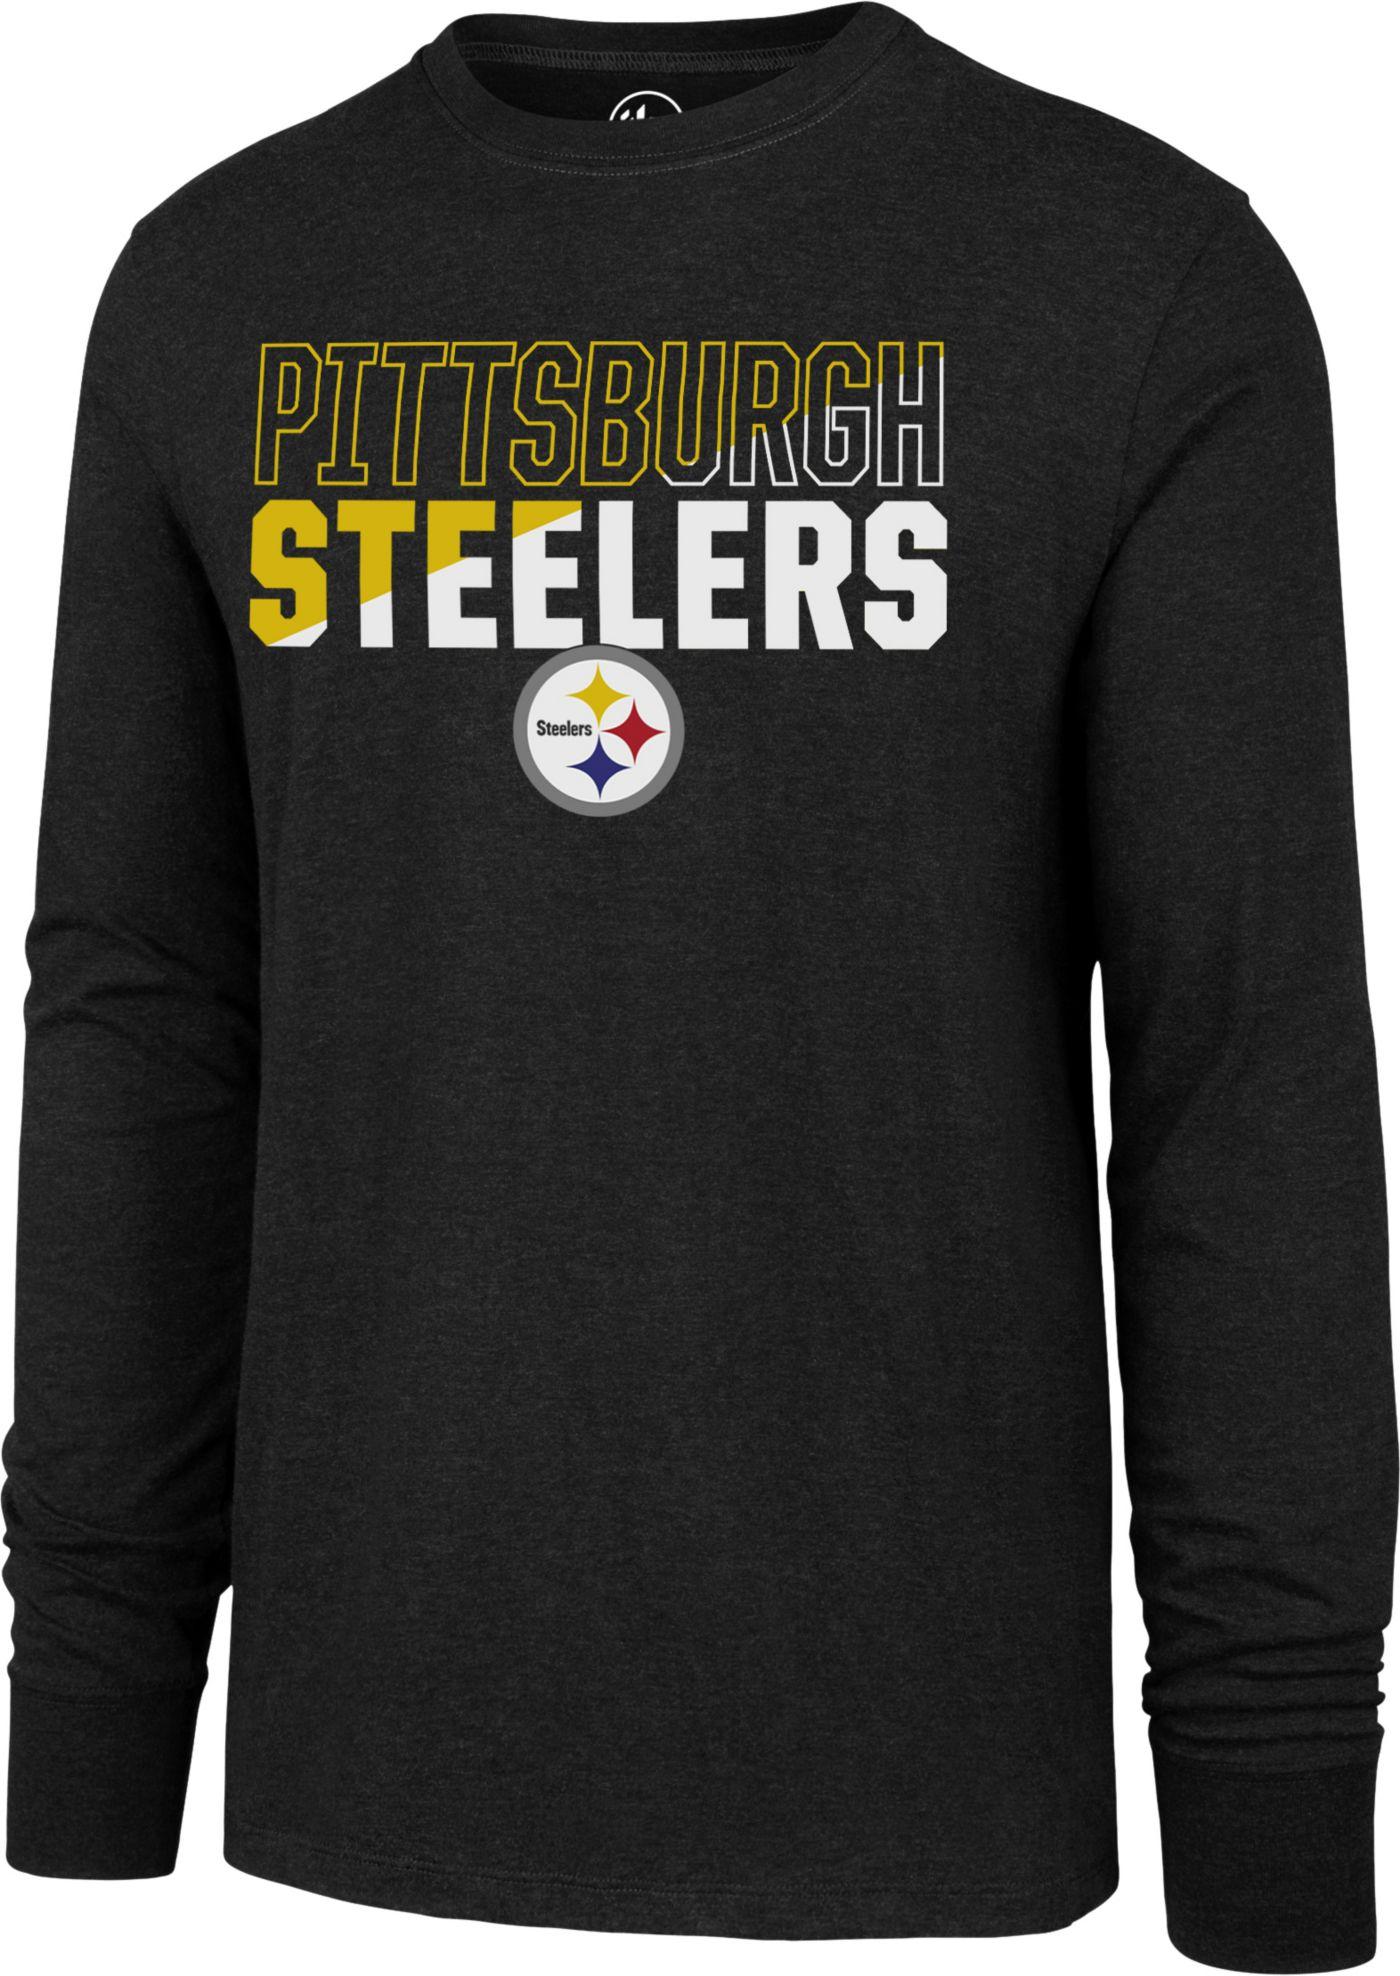 '47 Men's Pittsburgh Steelers Club Long Sleeve Black Shirt